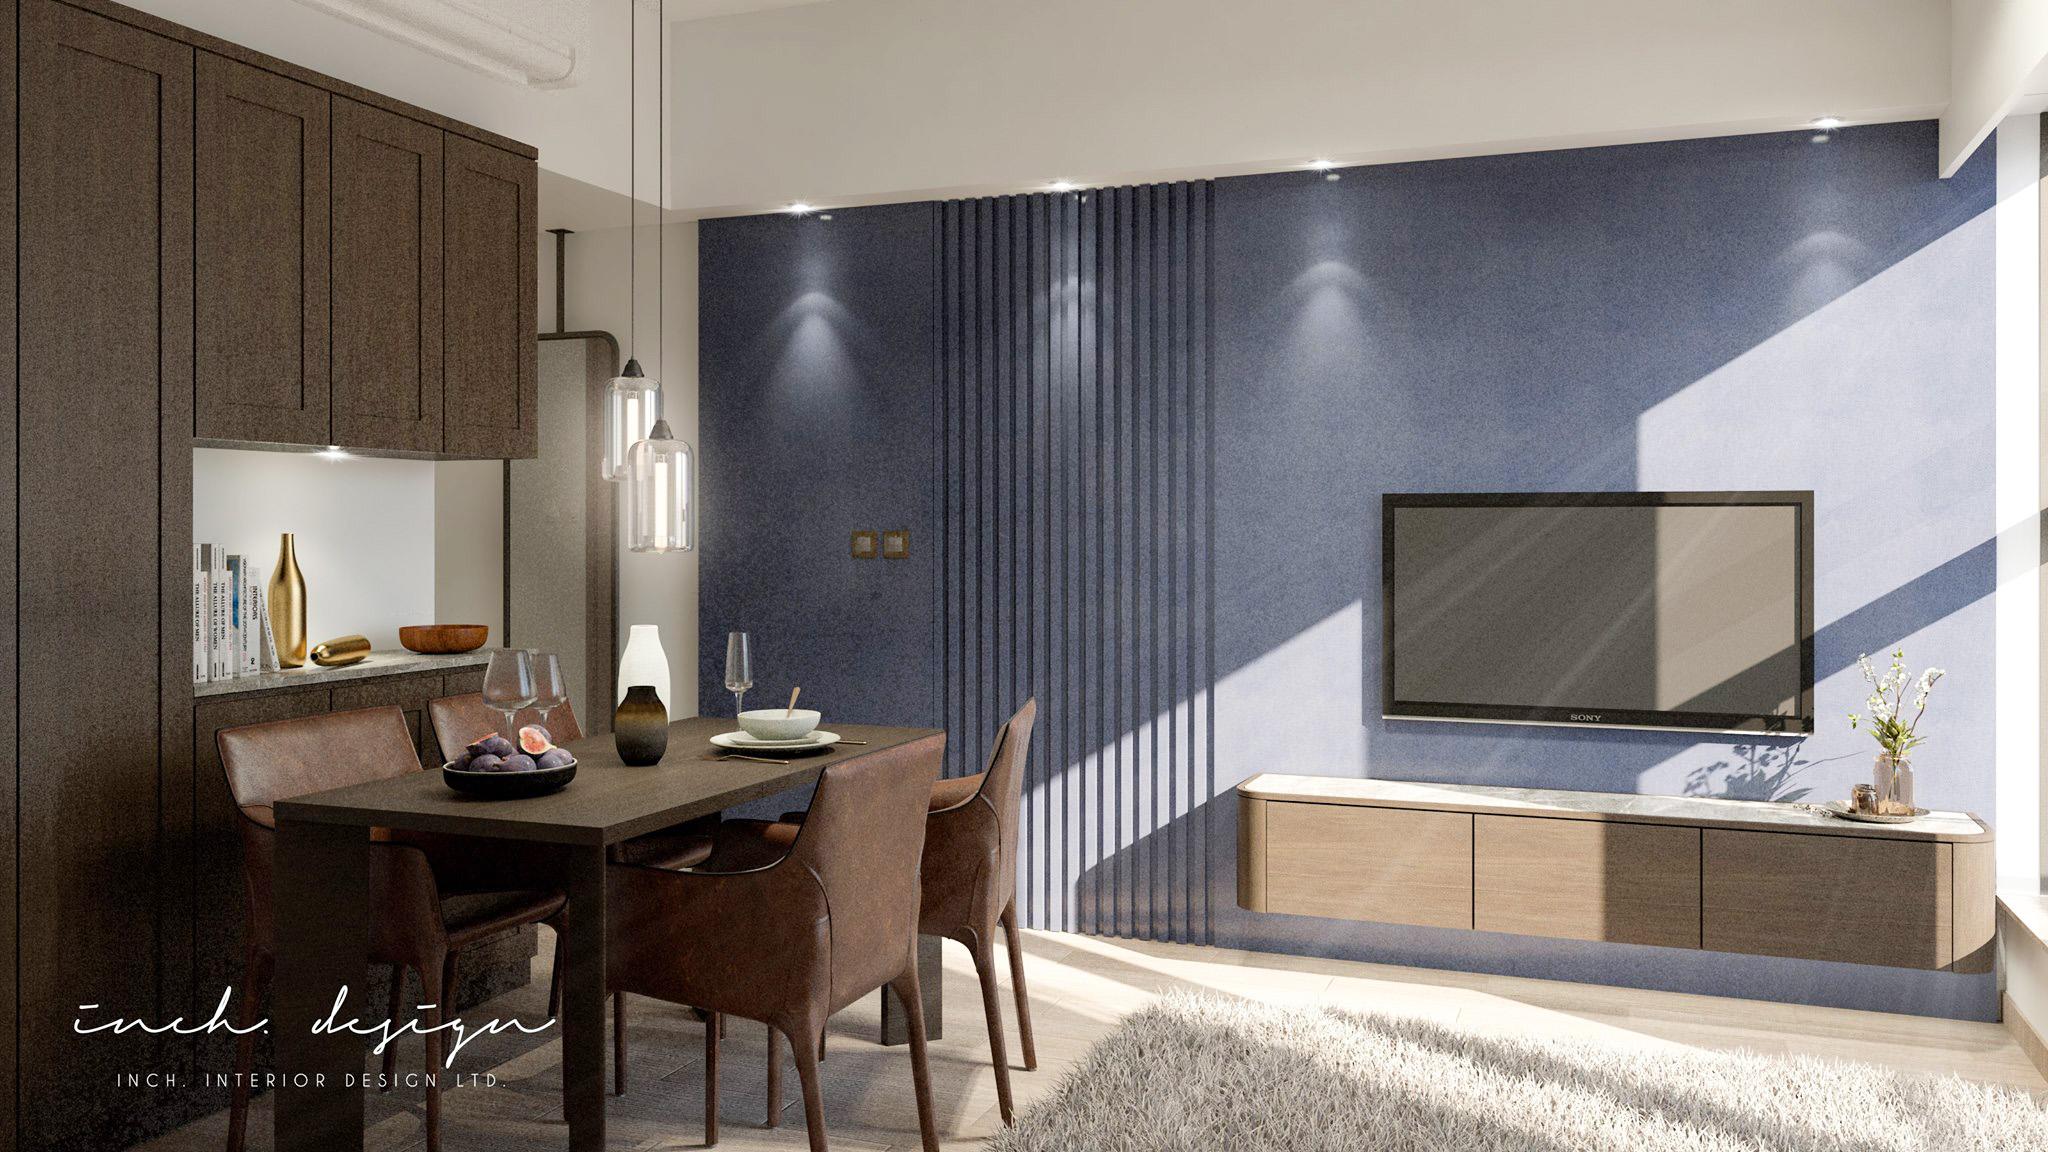 Inch Interior Design Victoria Skye Concept Image 002